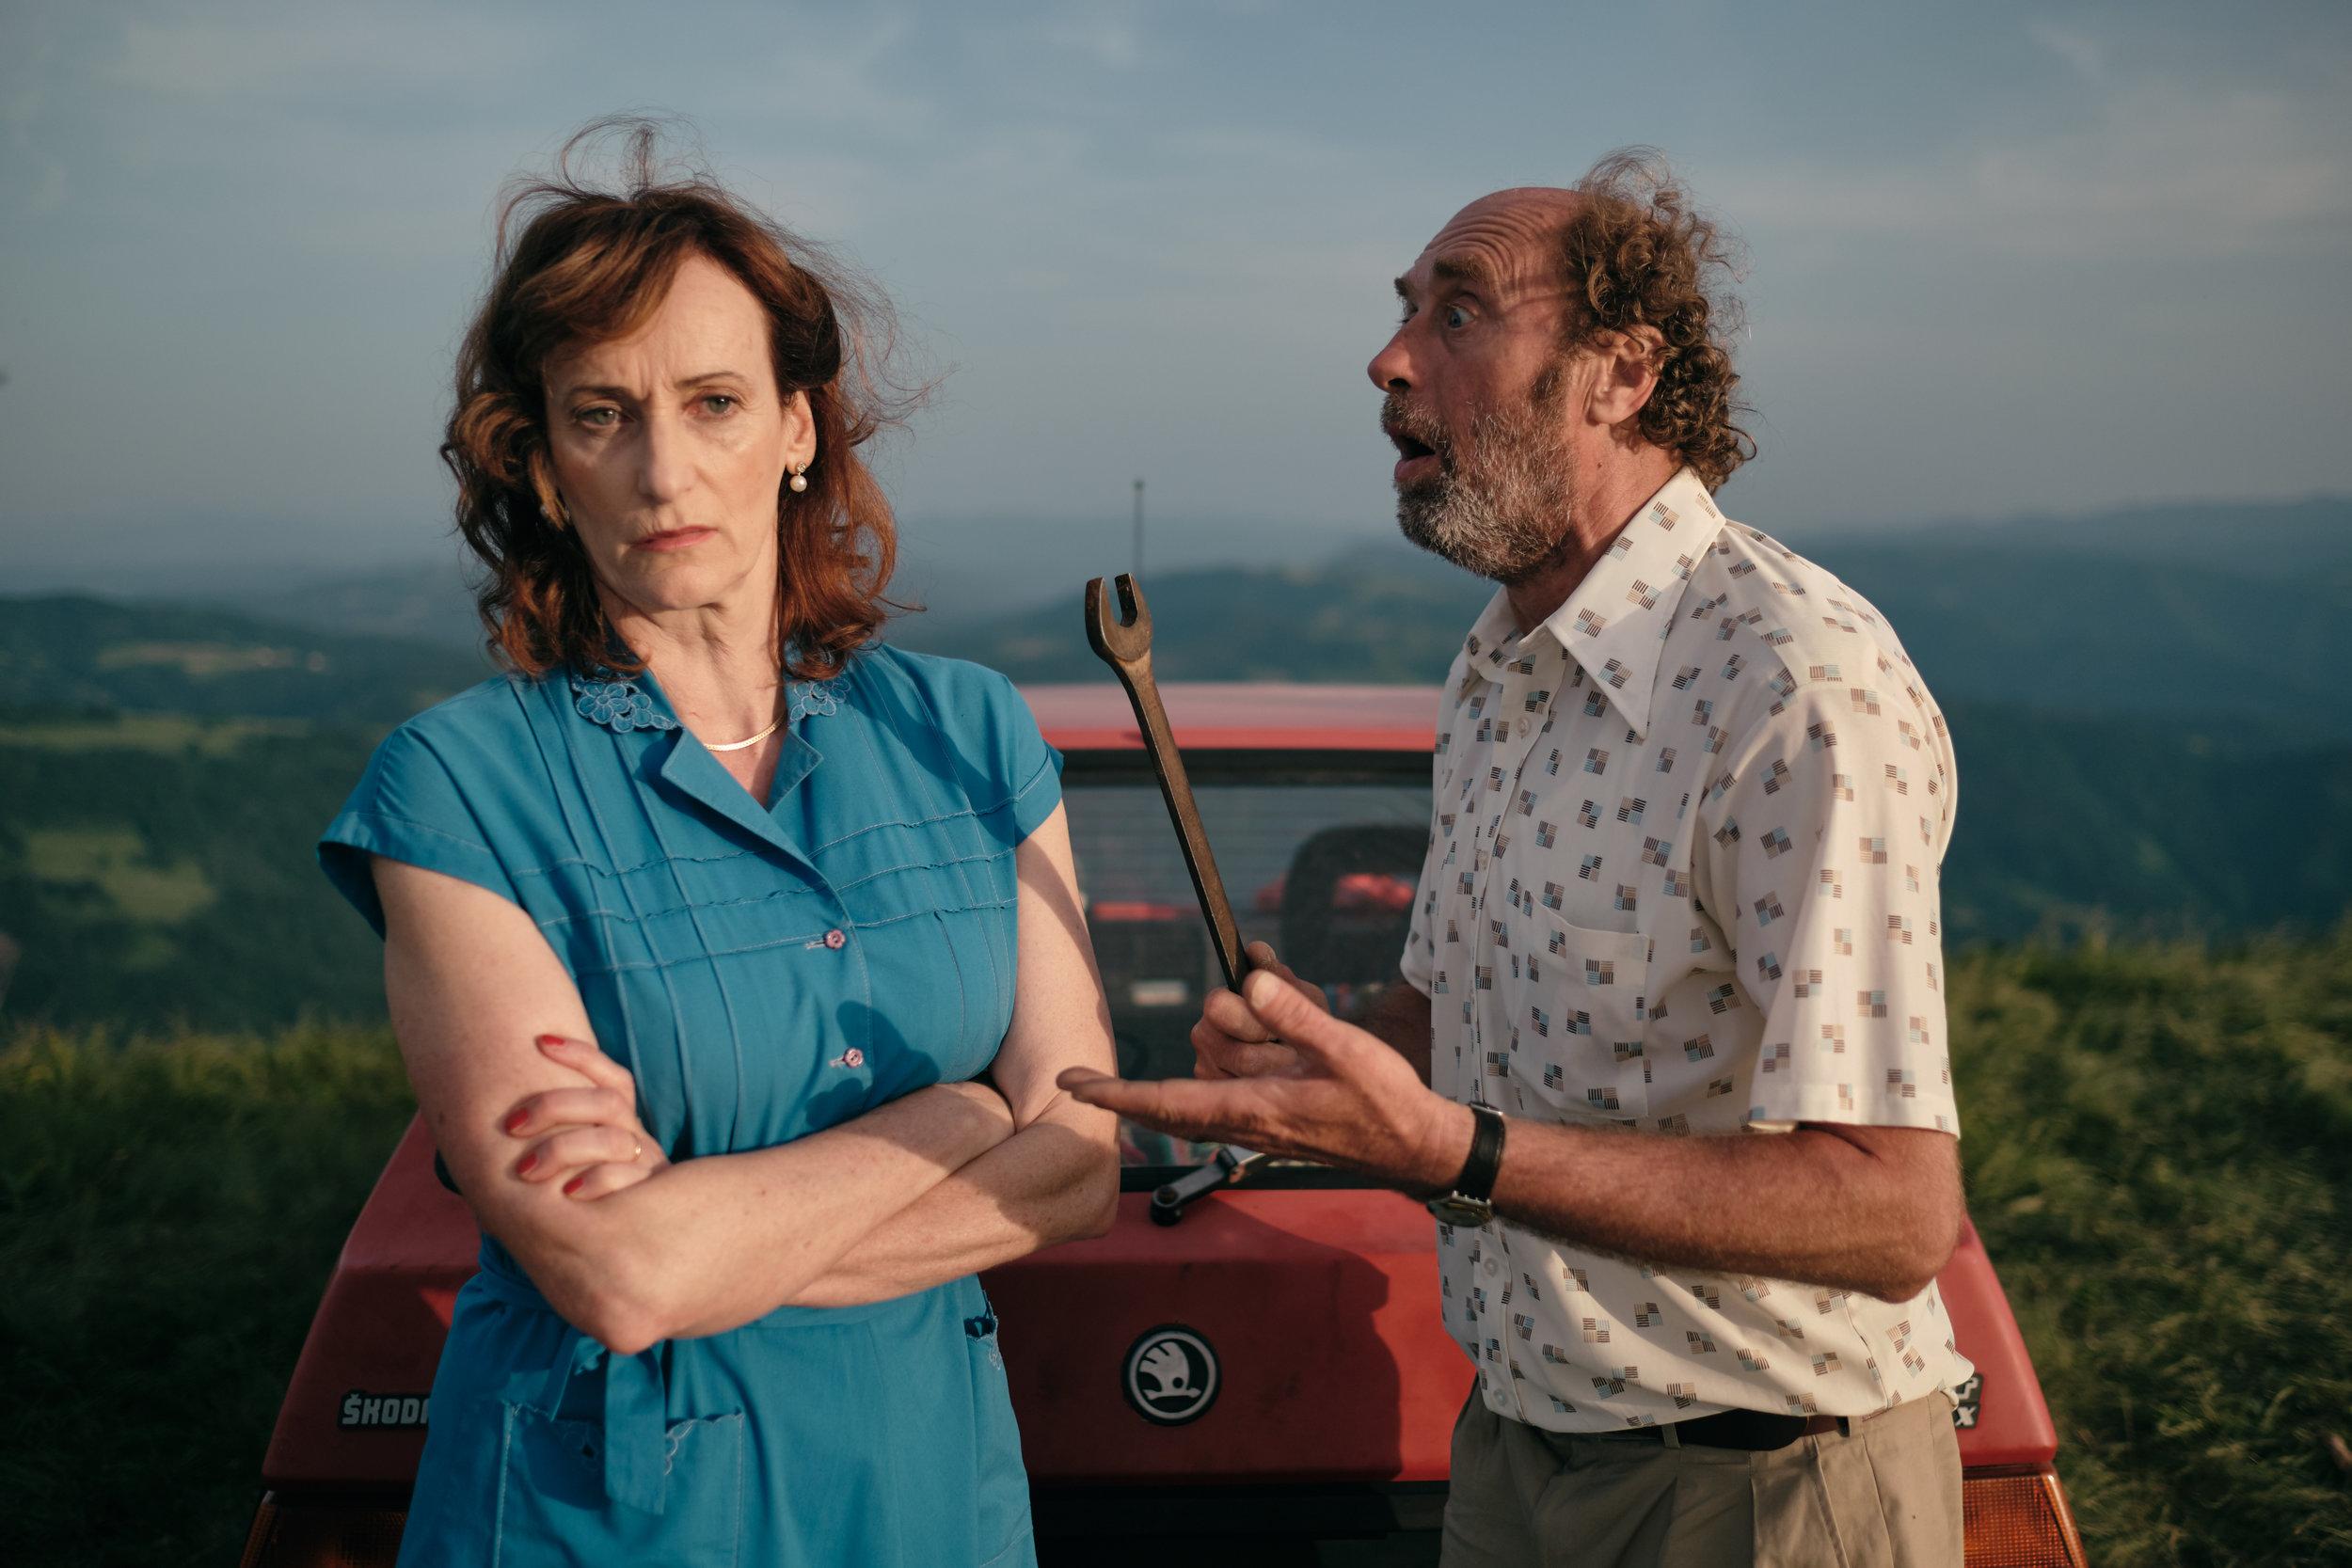 'Kratki rezi' (2019)    Production: EnaBanda    Director: Jure Dostal    DOP: Darko Sintic    In frame: Sasa Pavcek, Janez Skof